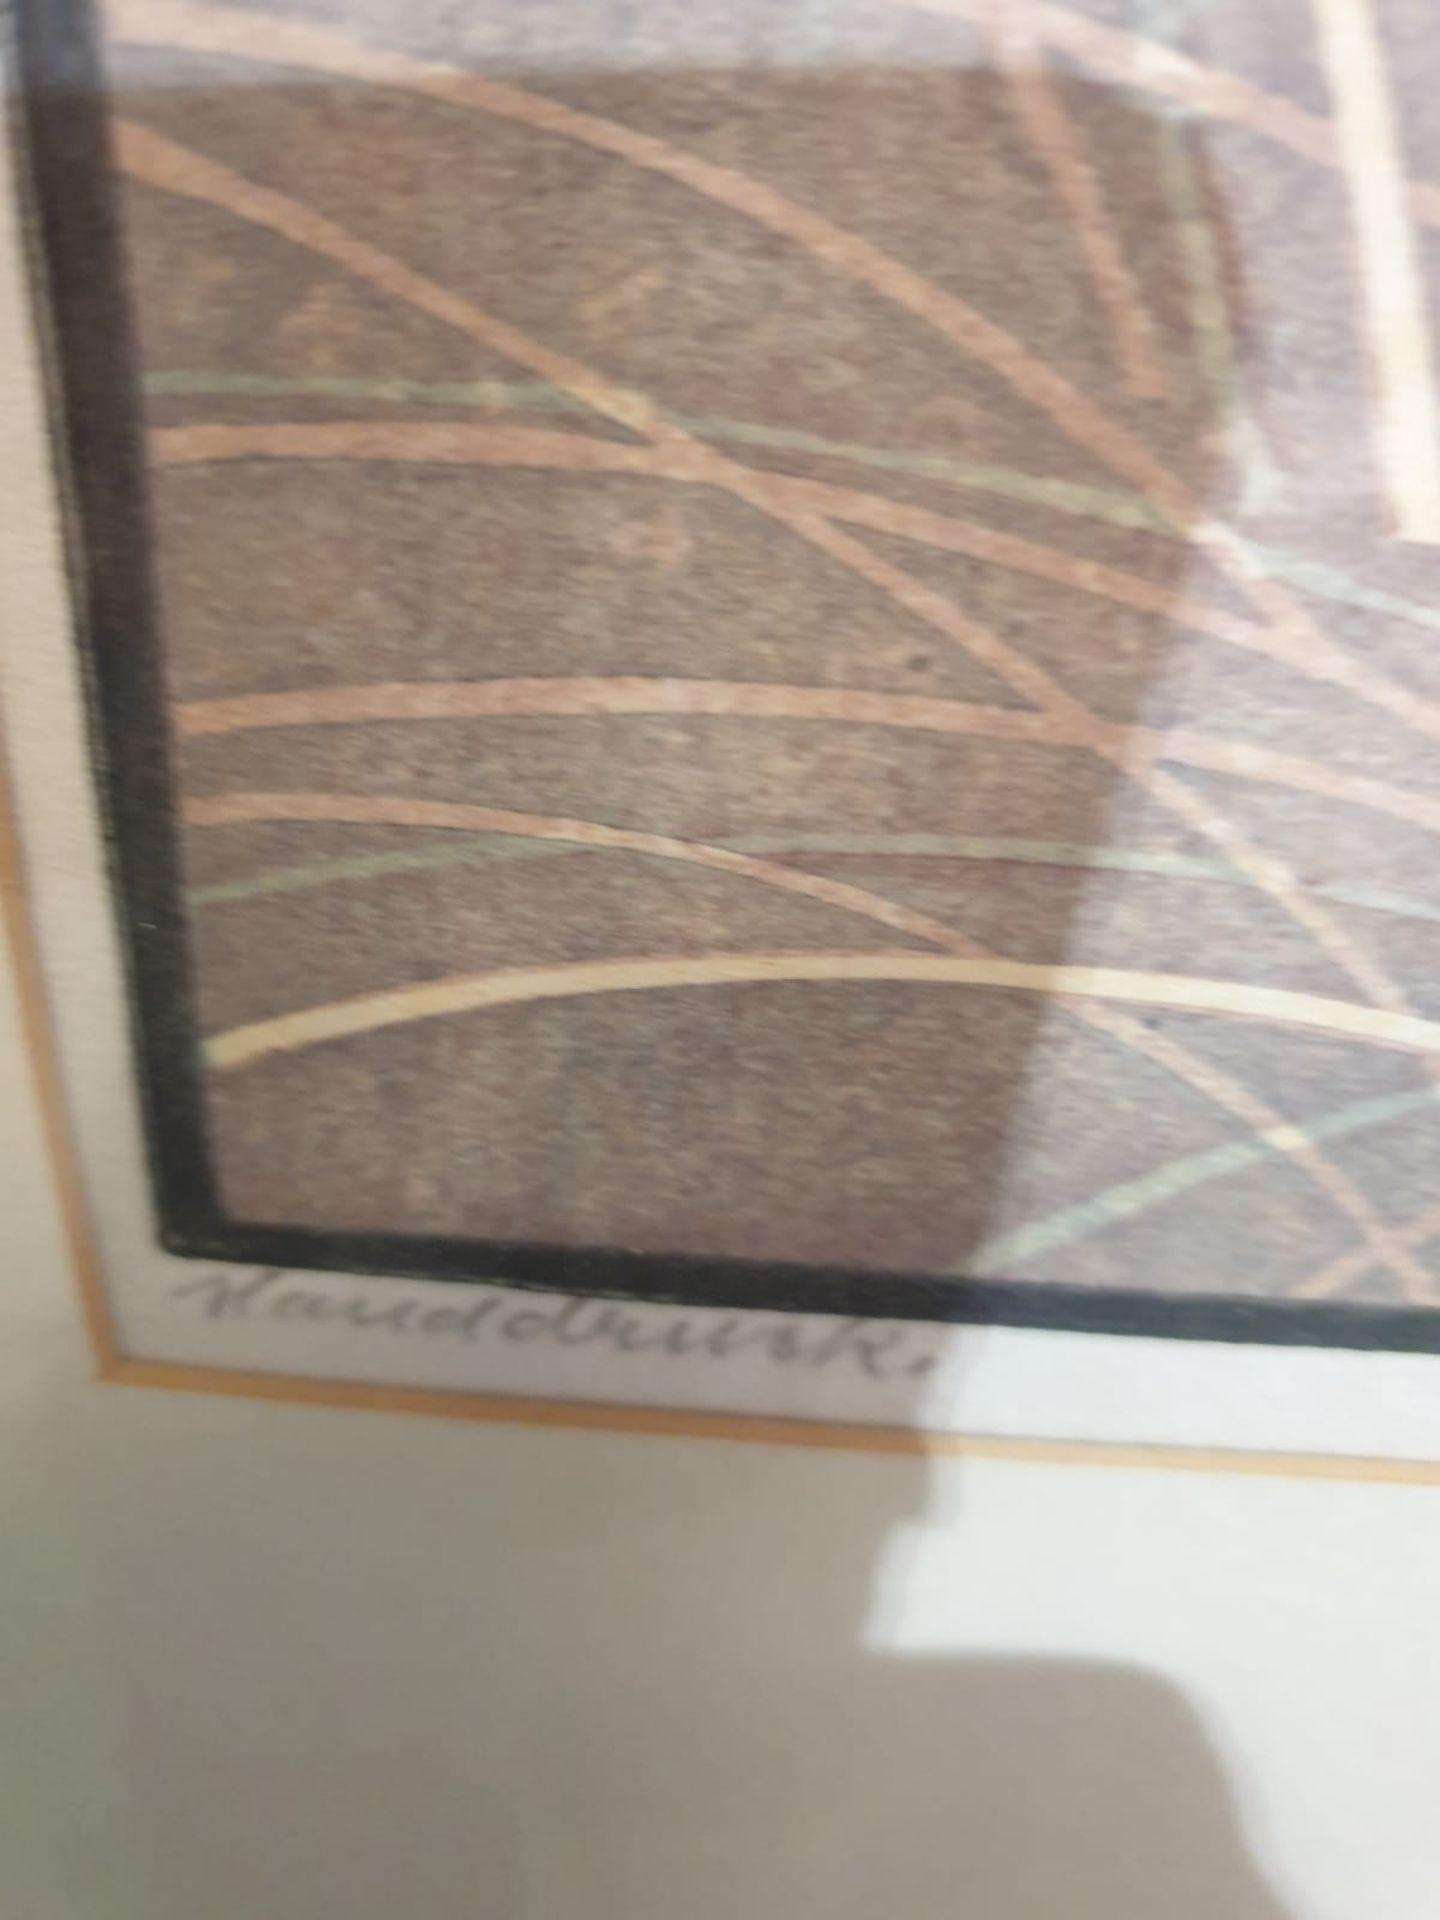 Line cut print multiple by Von Bresslern - Roth 1891-1978 tiger chasing Gazelles c. Circa 1920 - Image 5 of 6